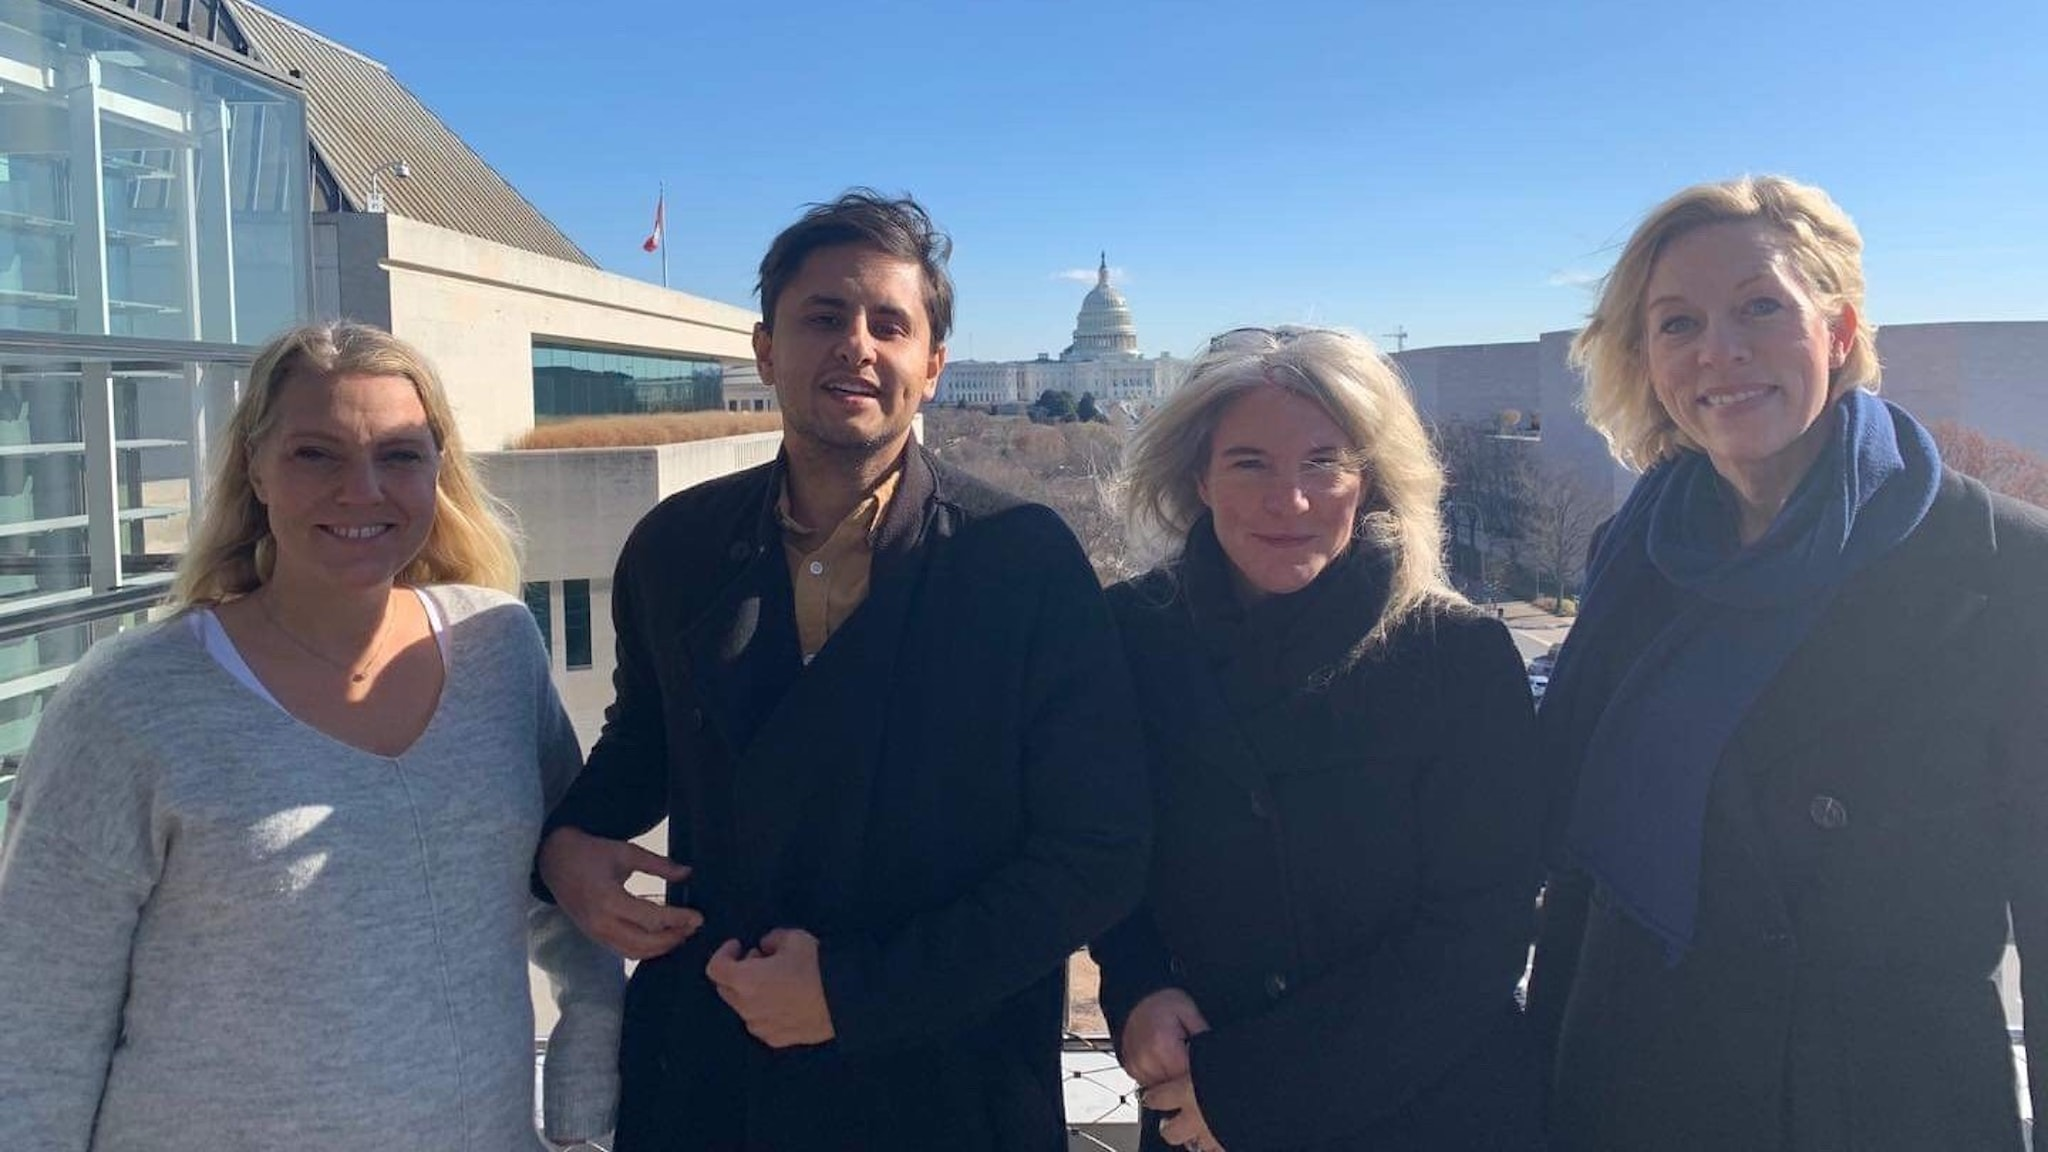 Podden på plats i Washington. Carina Bergfeldt, Fernando Arias, Sara Stenholm Pihl, Ginna Lindberg.